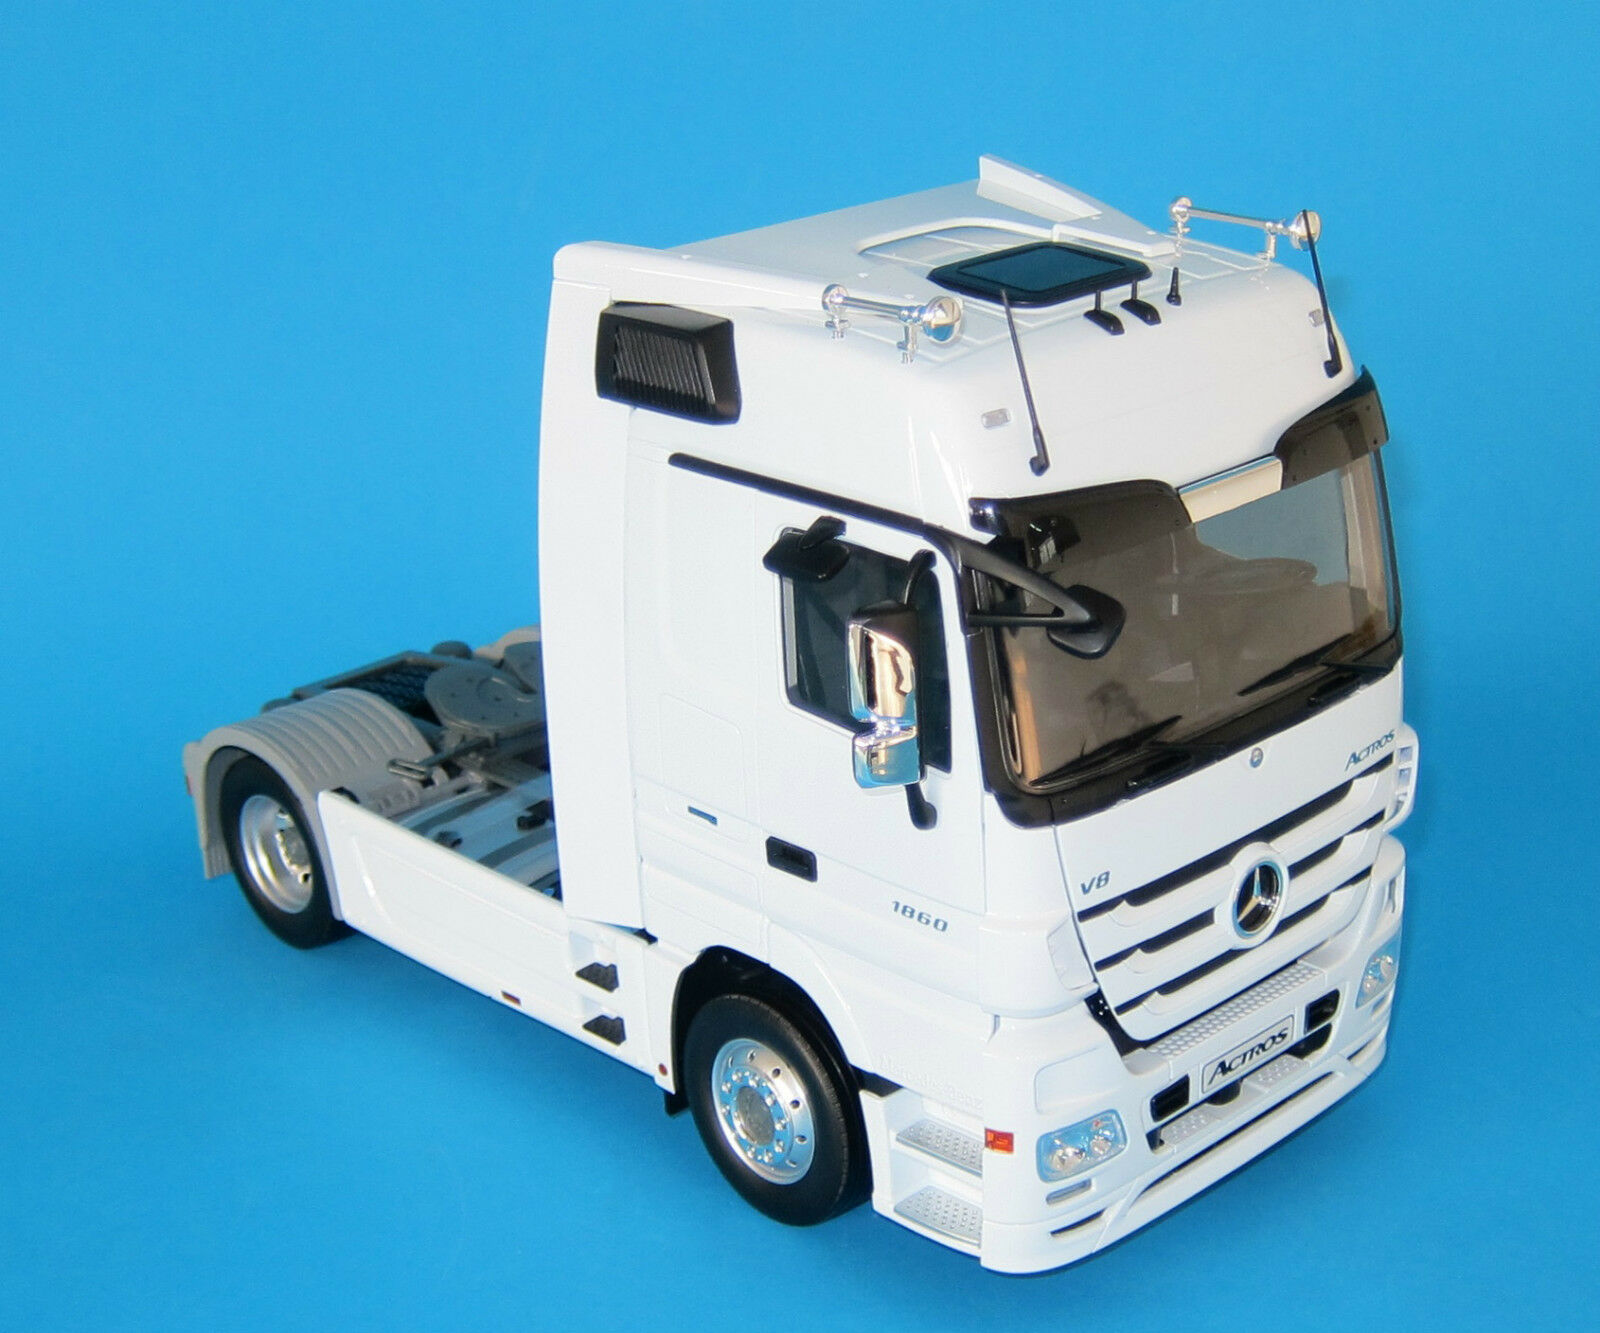 Eligor Mercedes - Benz Actros Truck 1 18 scale die cast WHITE RARE